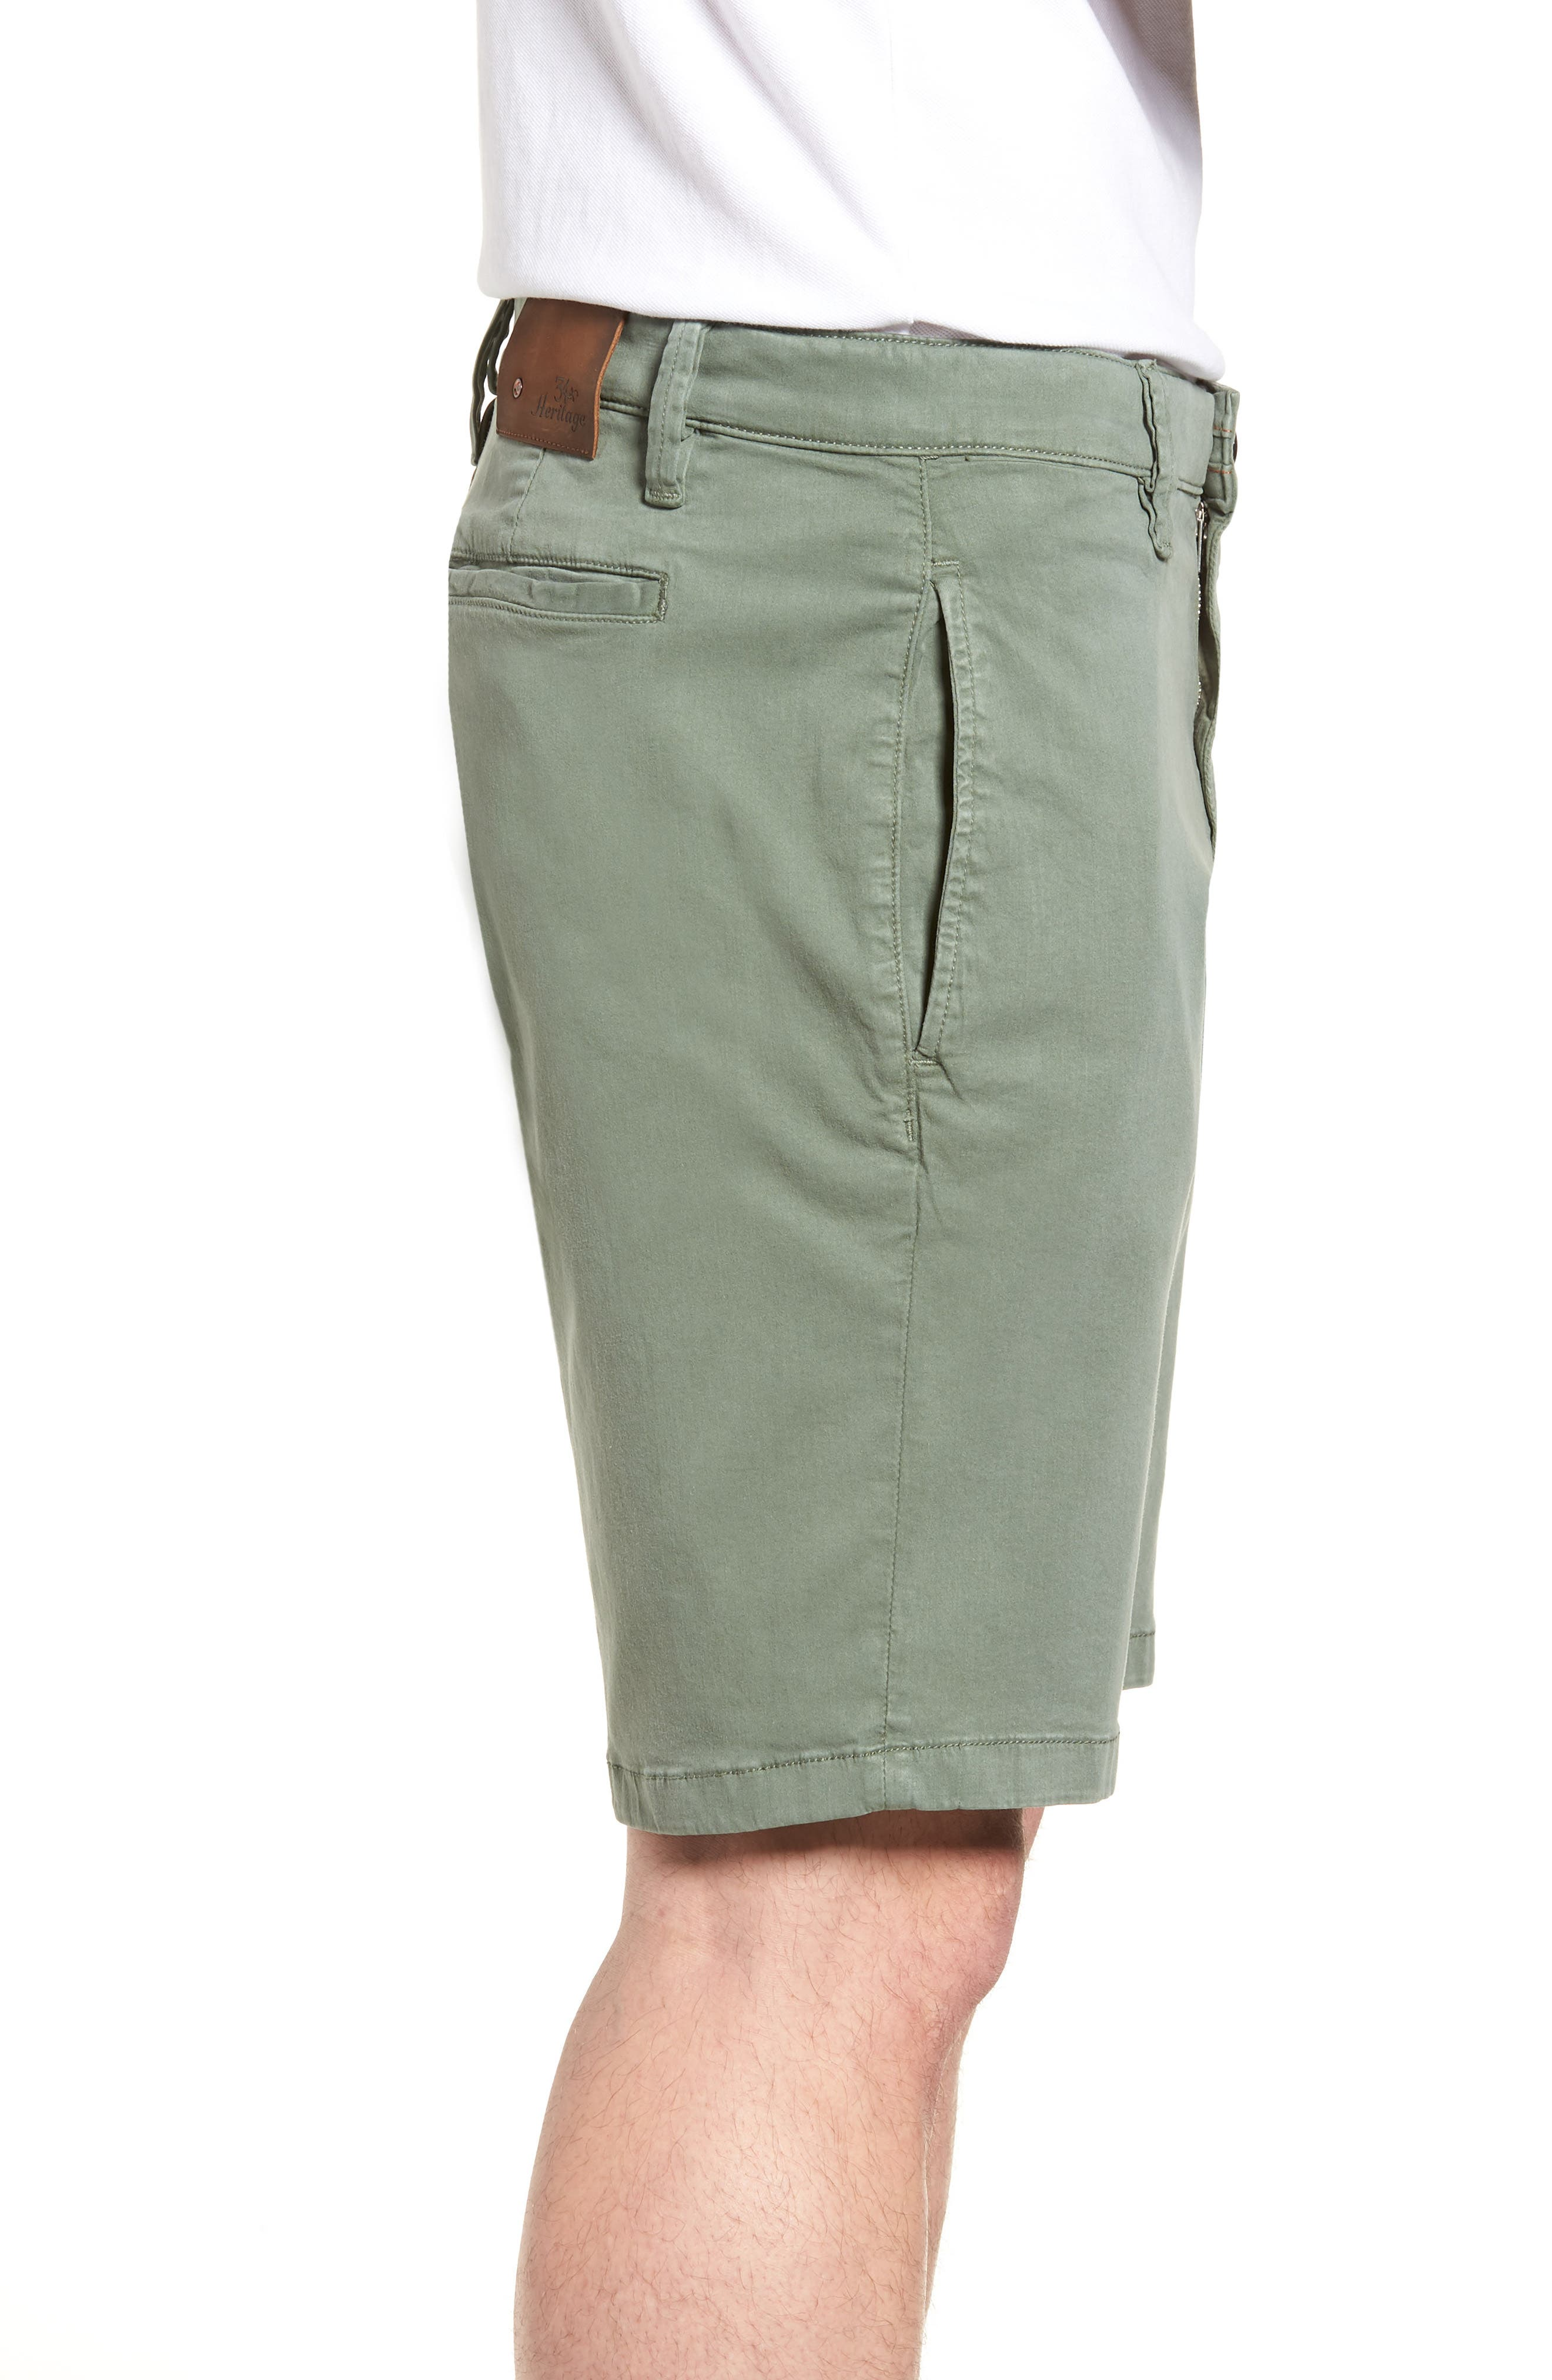 34 HERITAGE,                             Nevada Twill Shorts,                             Alternate thumbnail 3, color,                             MOSS TWILL